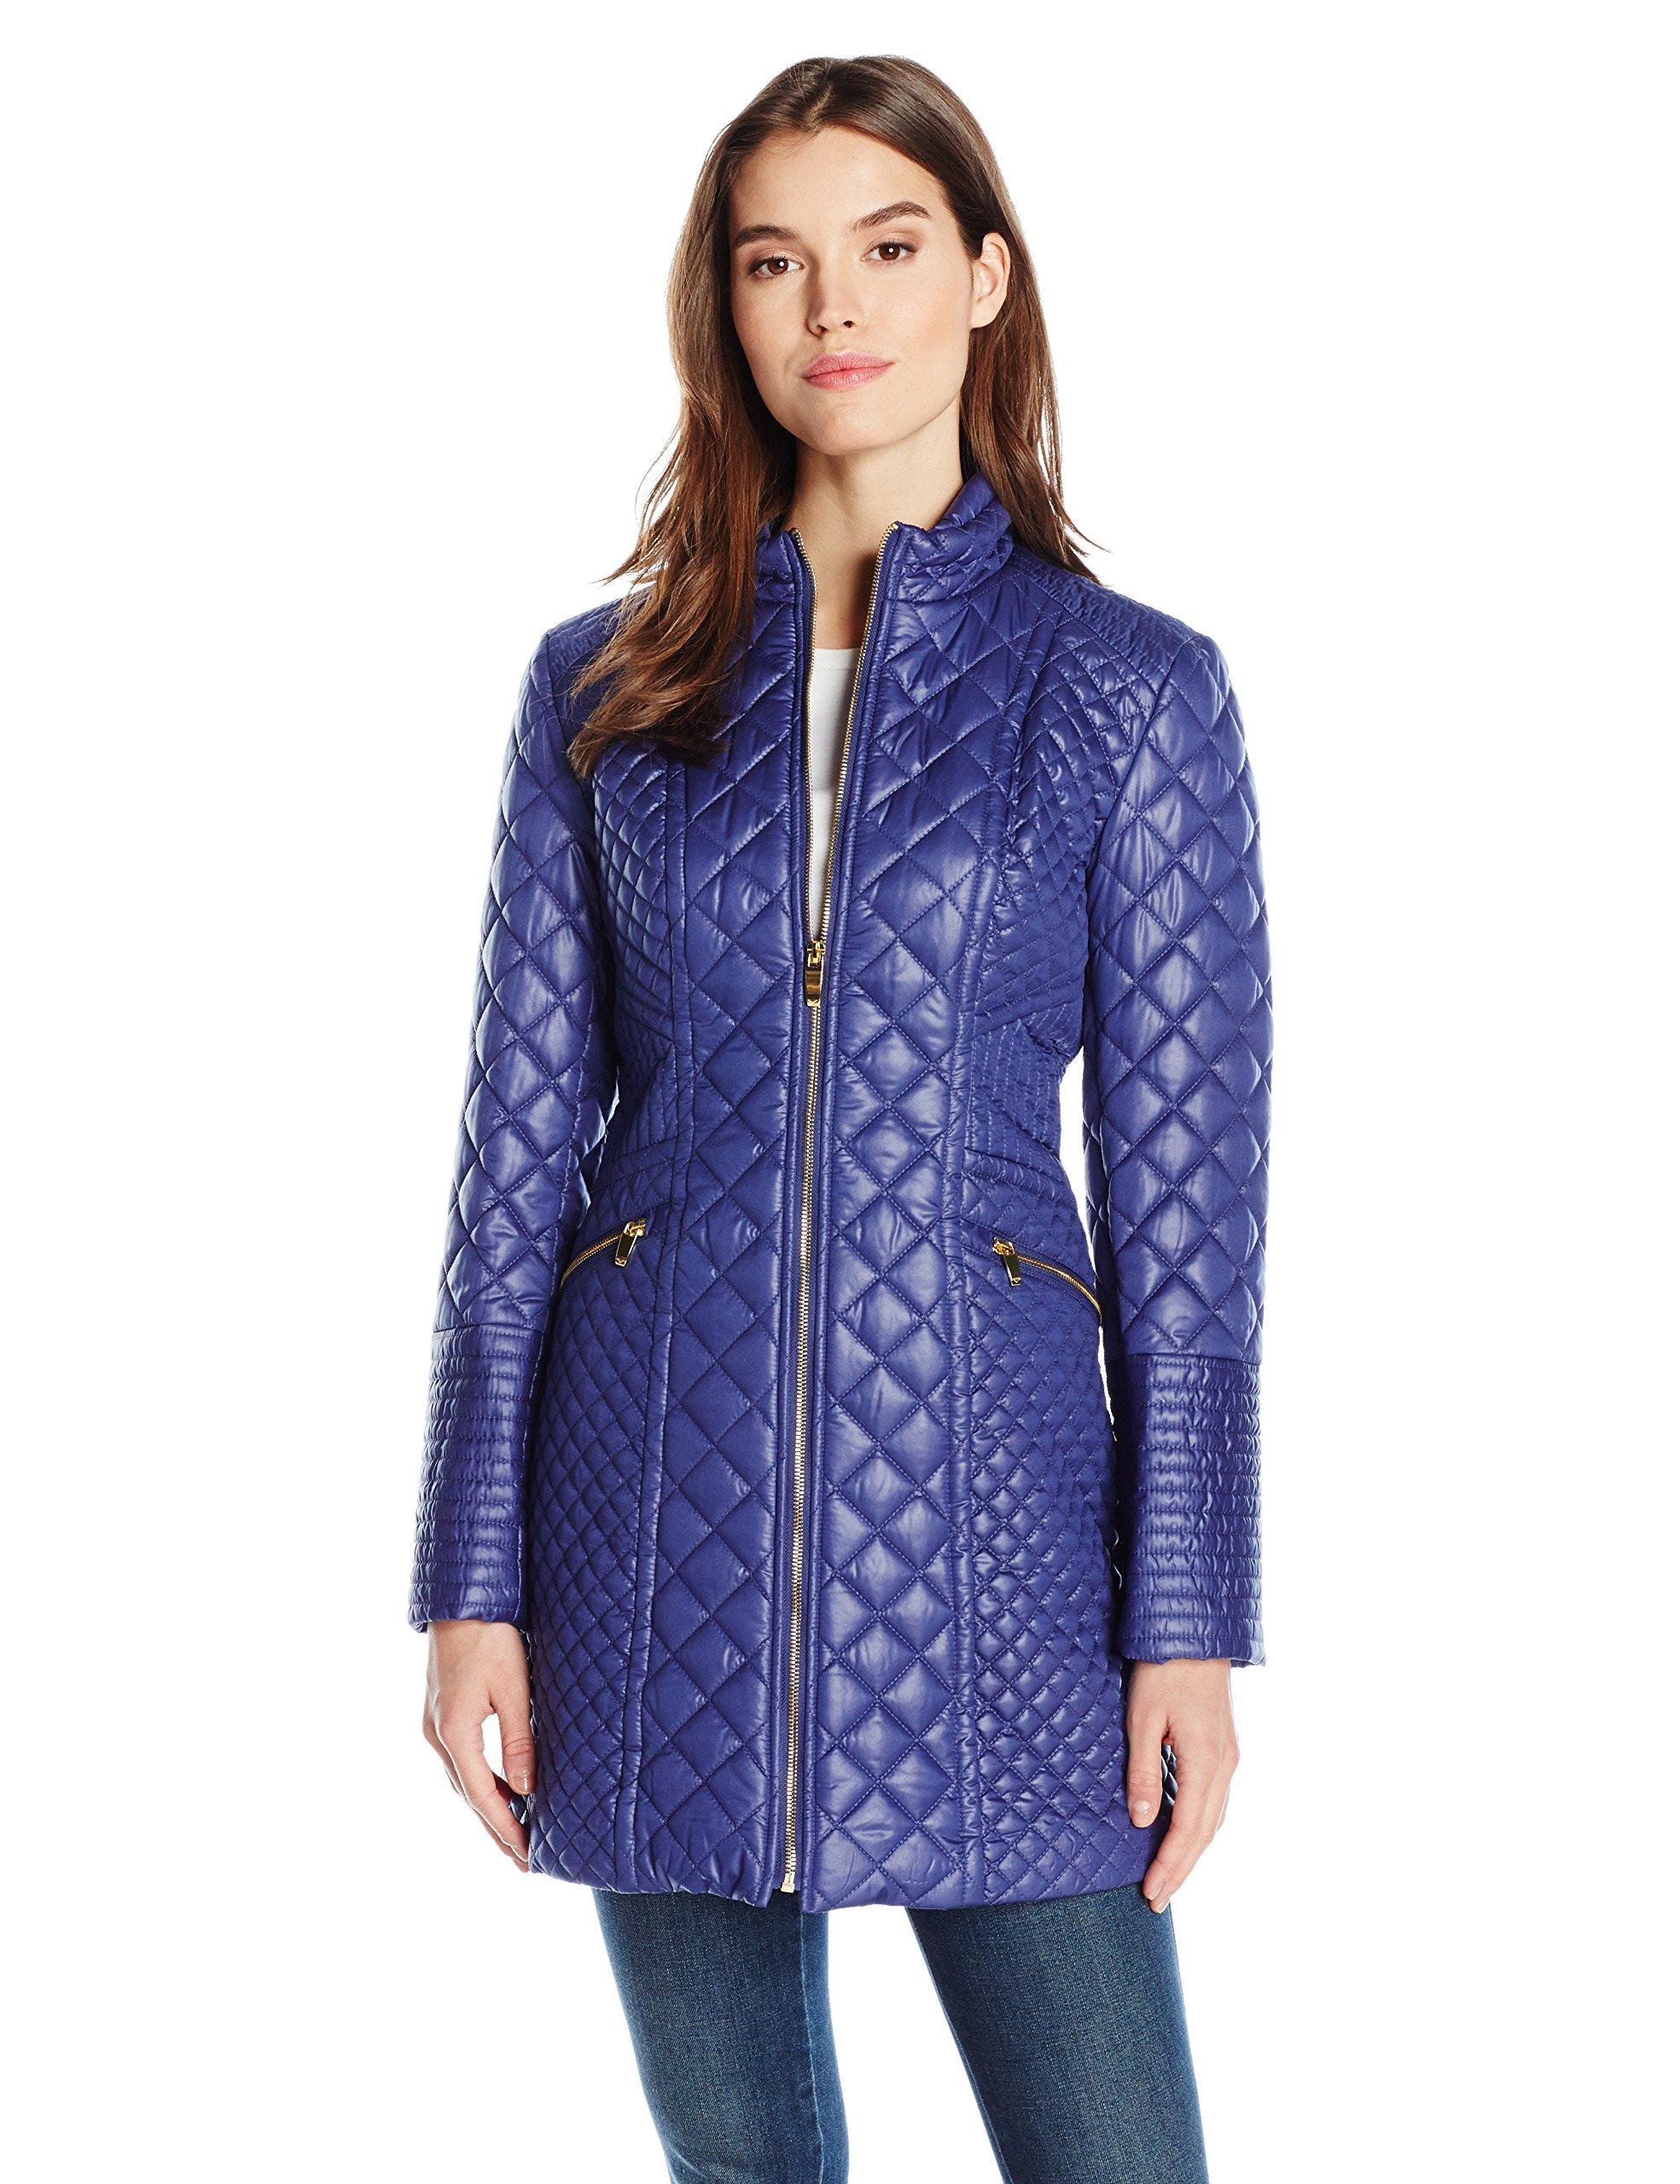 Via Spiga Women's Diamond Quilted Mid-Length Lightweight Jacket, Positano Blue, L